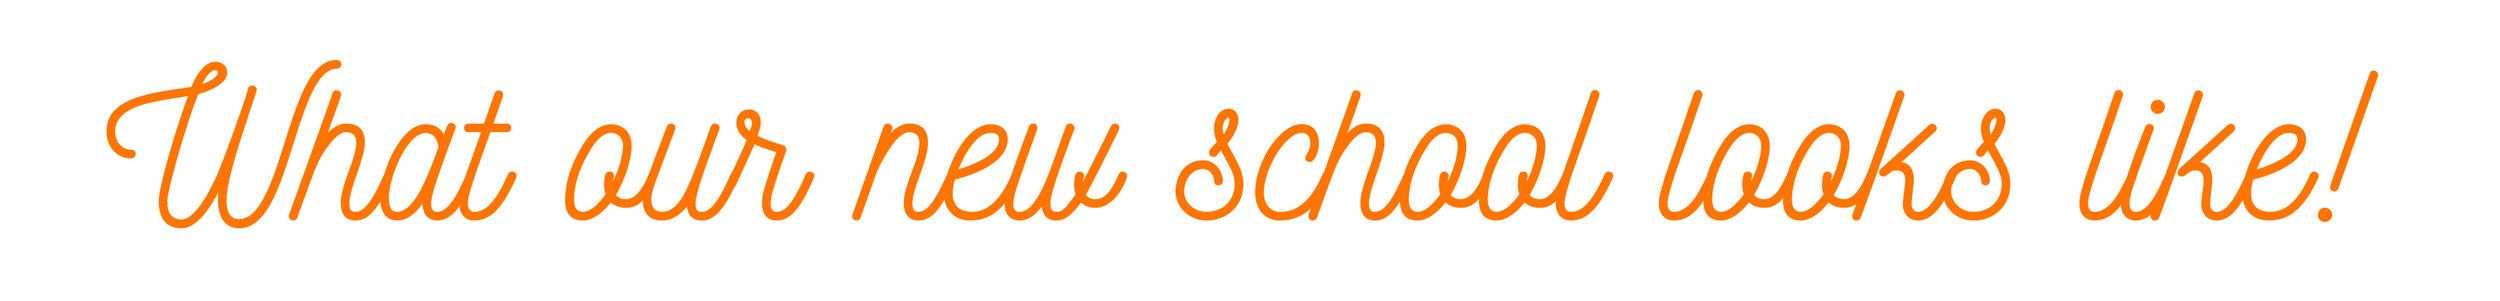 MRM-Web-NewSchool.jpg